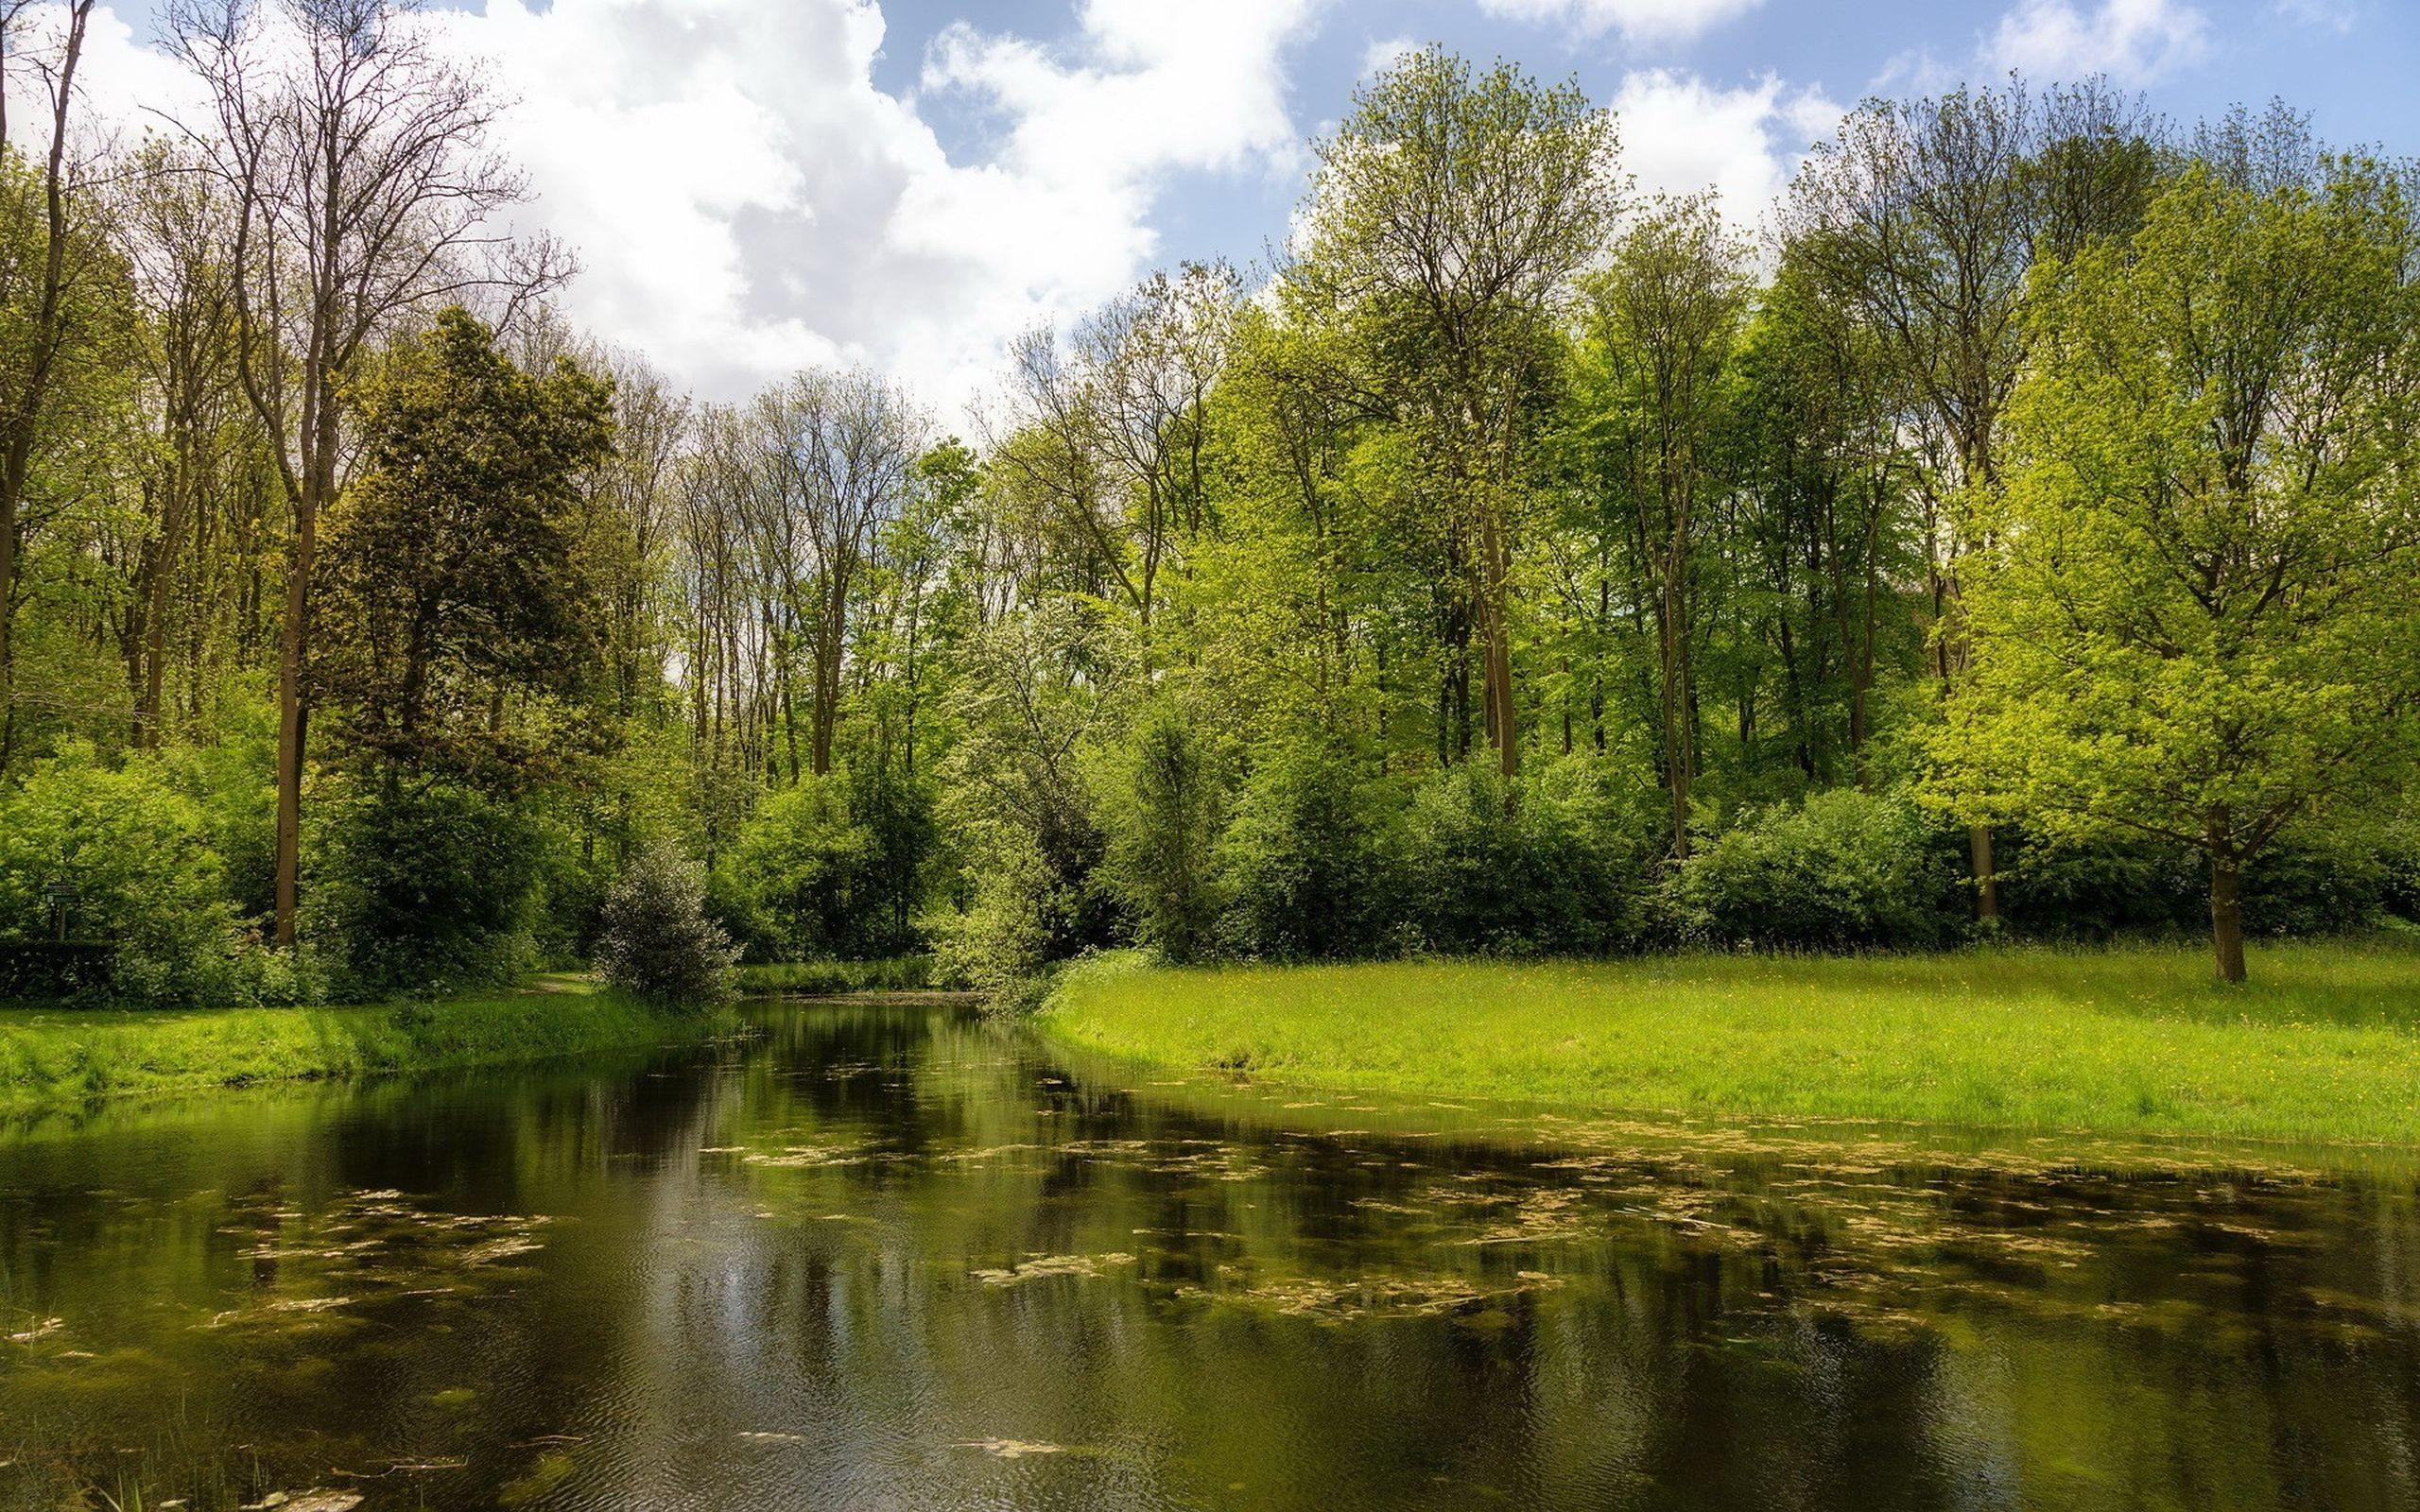 обои на рабочий стол осень природа река озеро лес № 241637 без смс